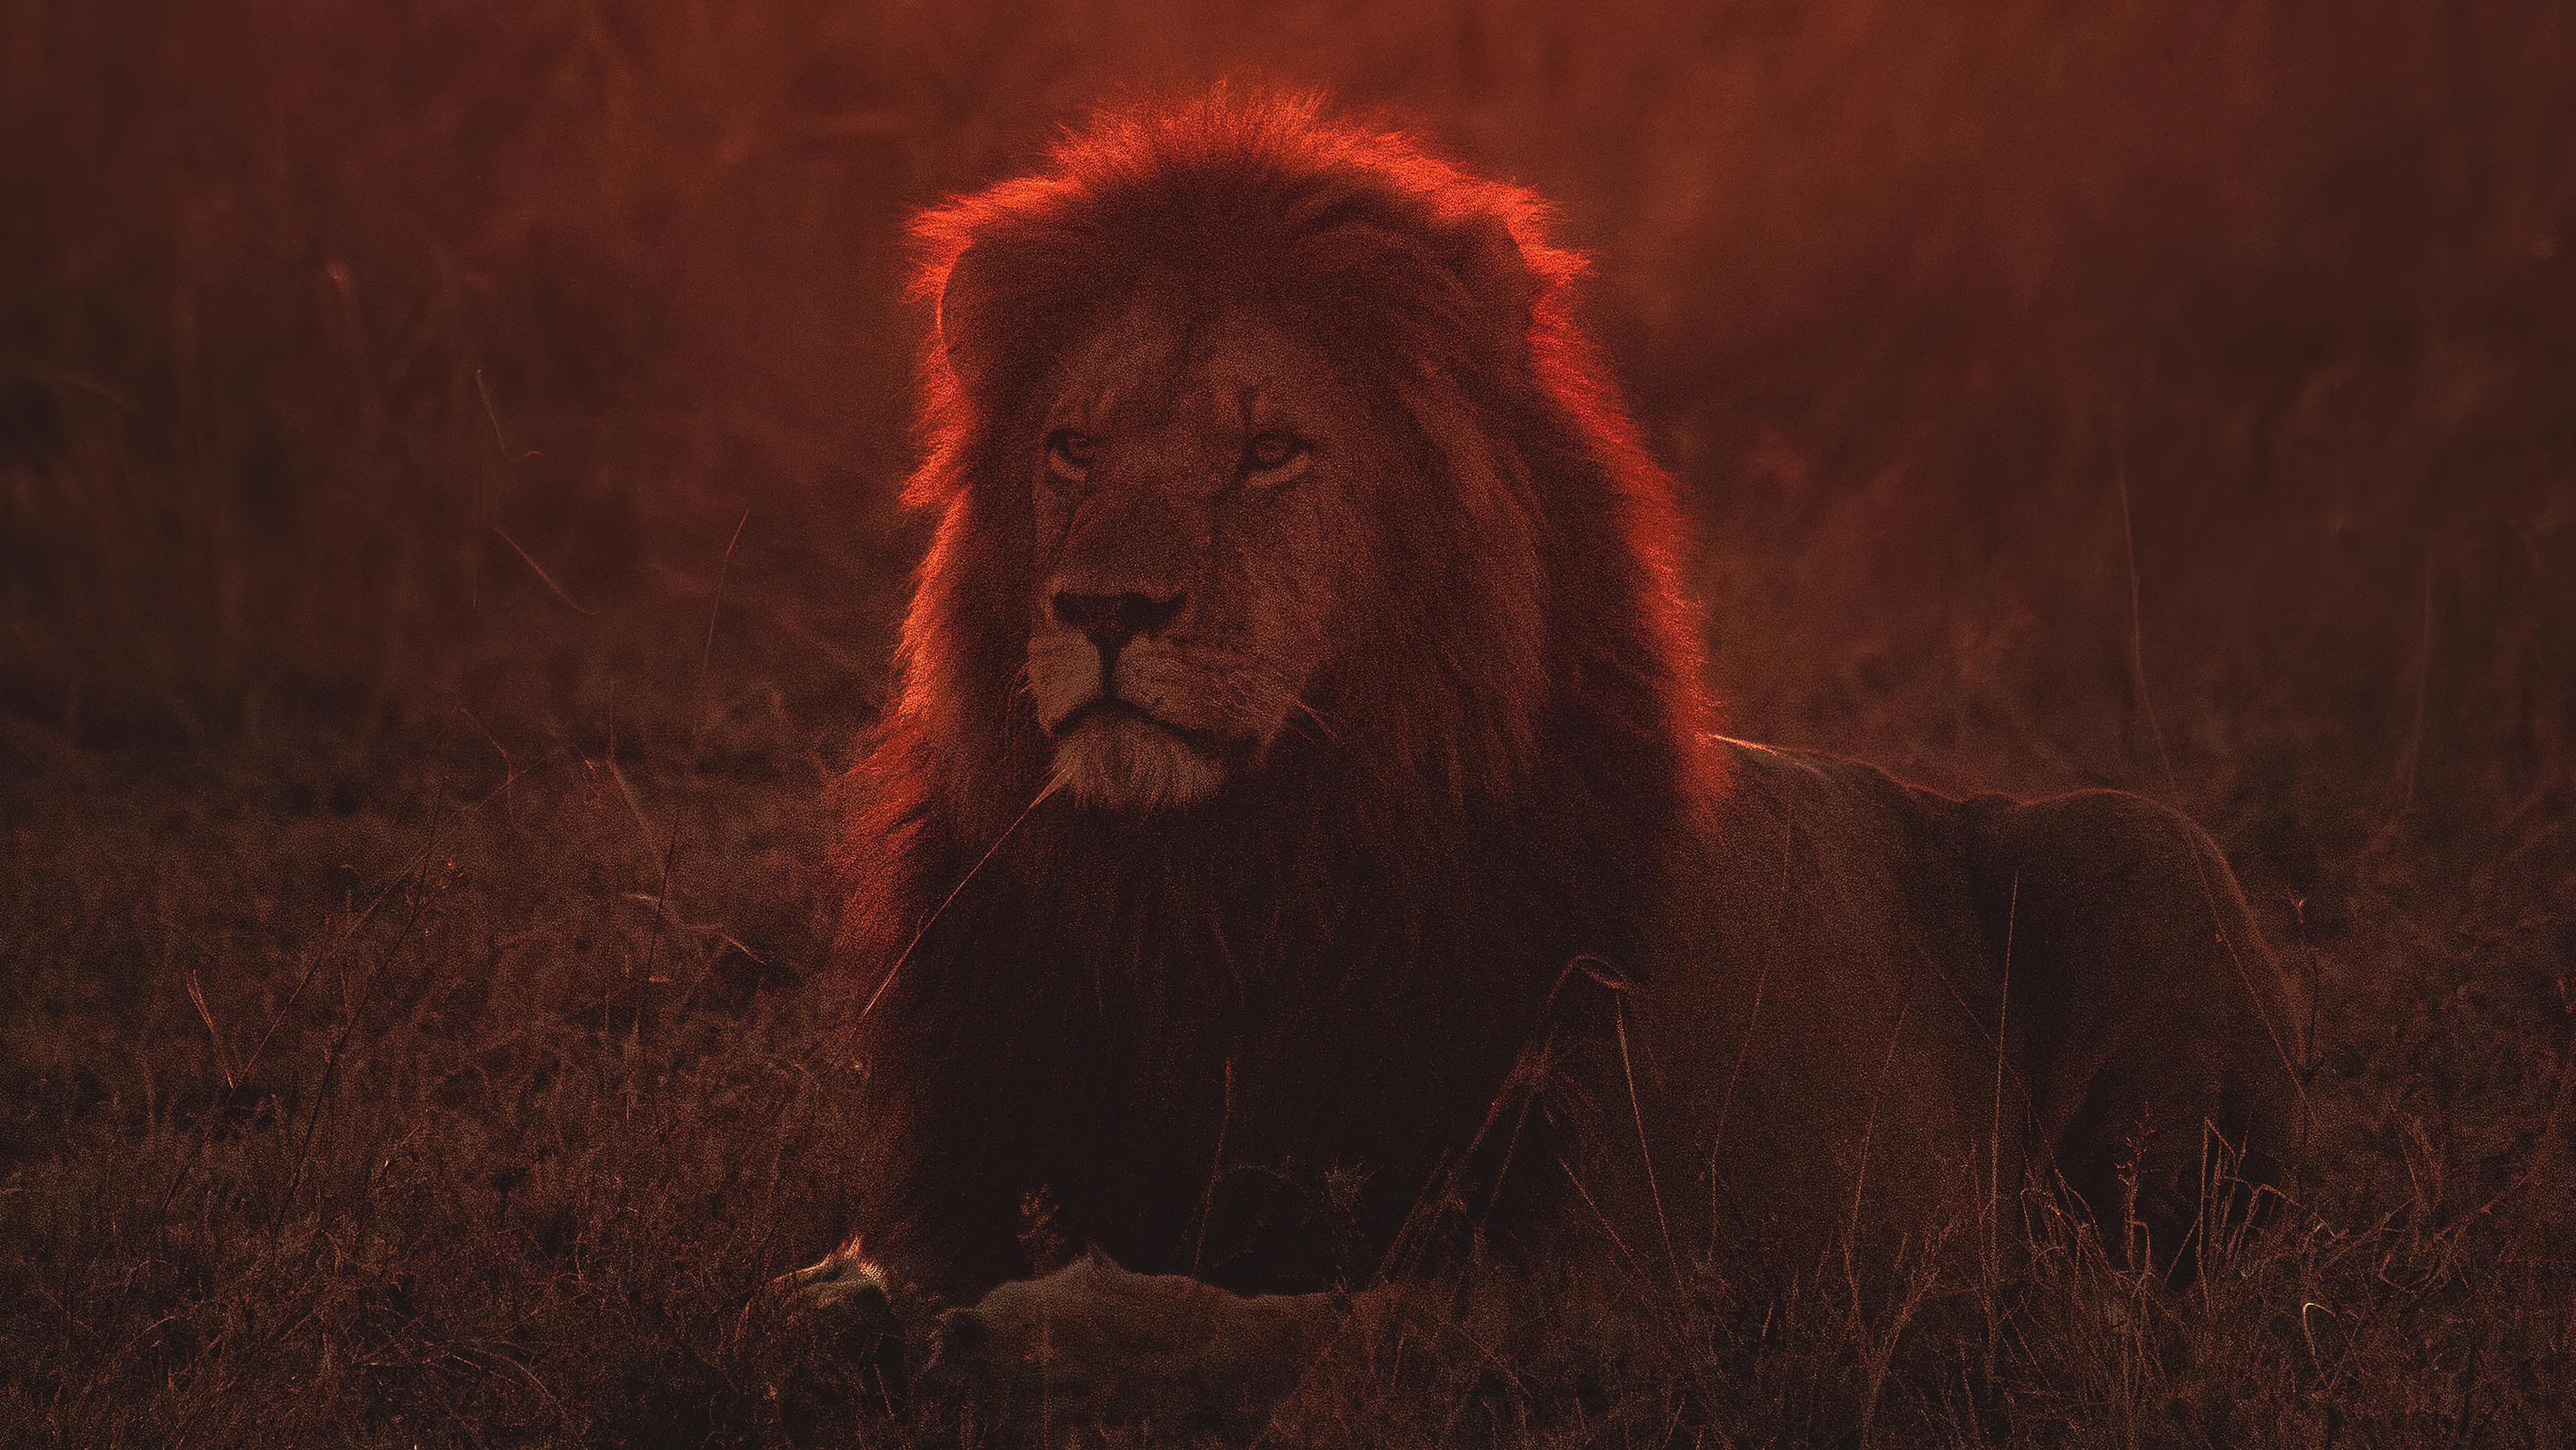 lion on green grass during golden hour 4k 1629139771 - Lion On Green Grass During Golden Hour 4k - Lion On Green Grass During Golden Hour wallpapers, Lion On Green Grass During Golden Hour 4k wallpapers